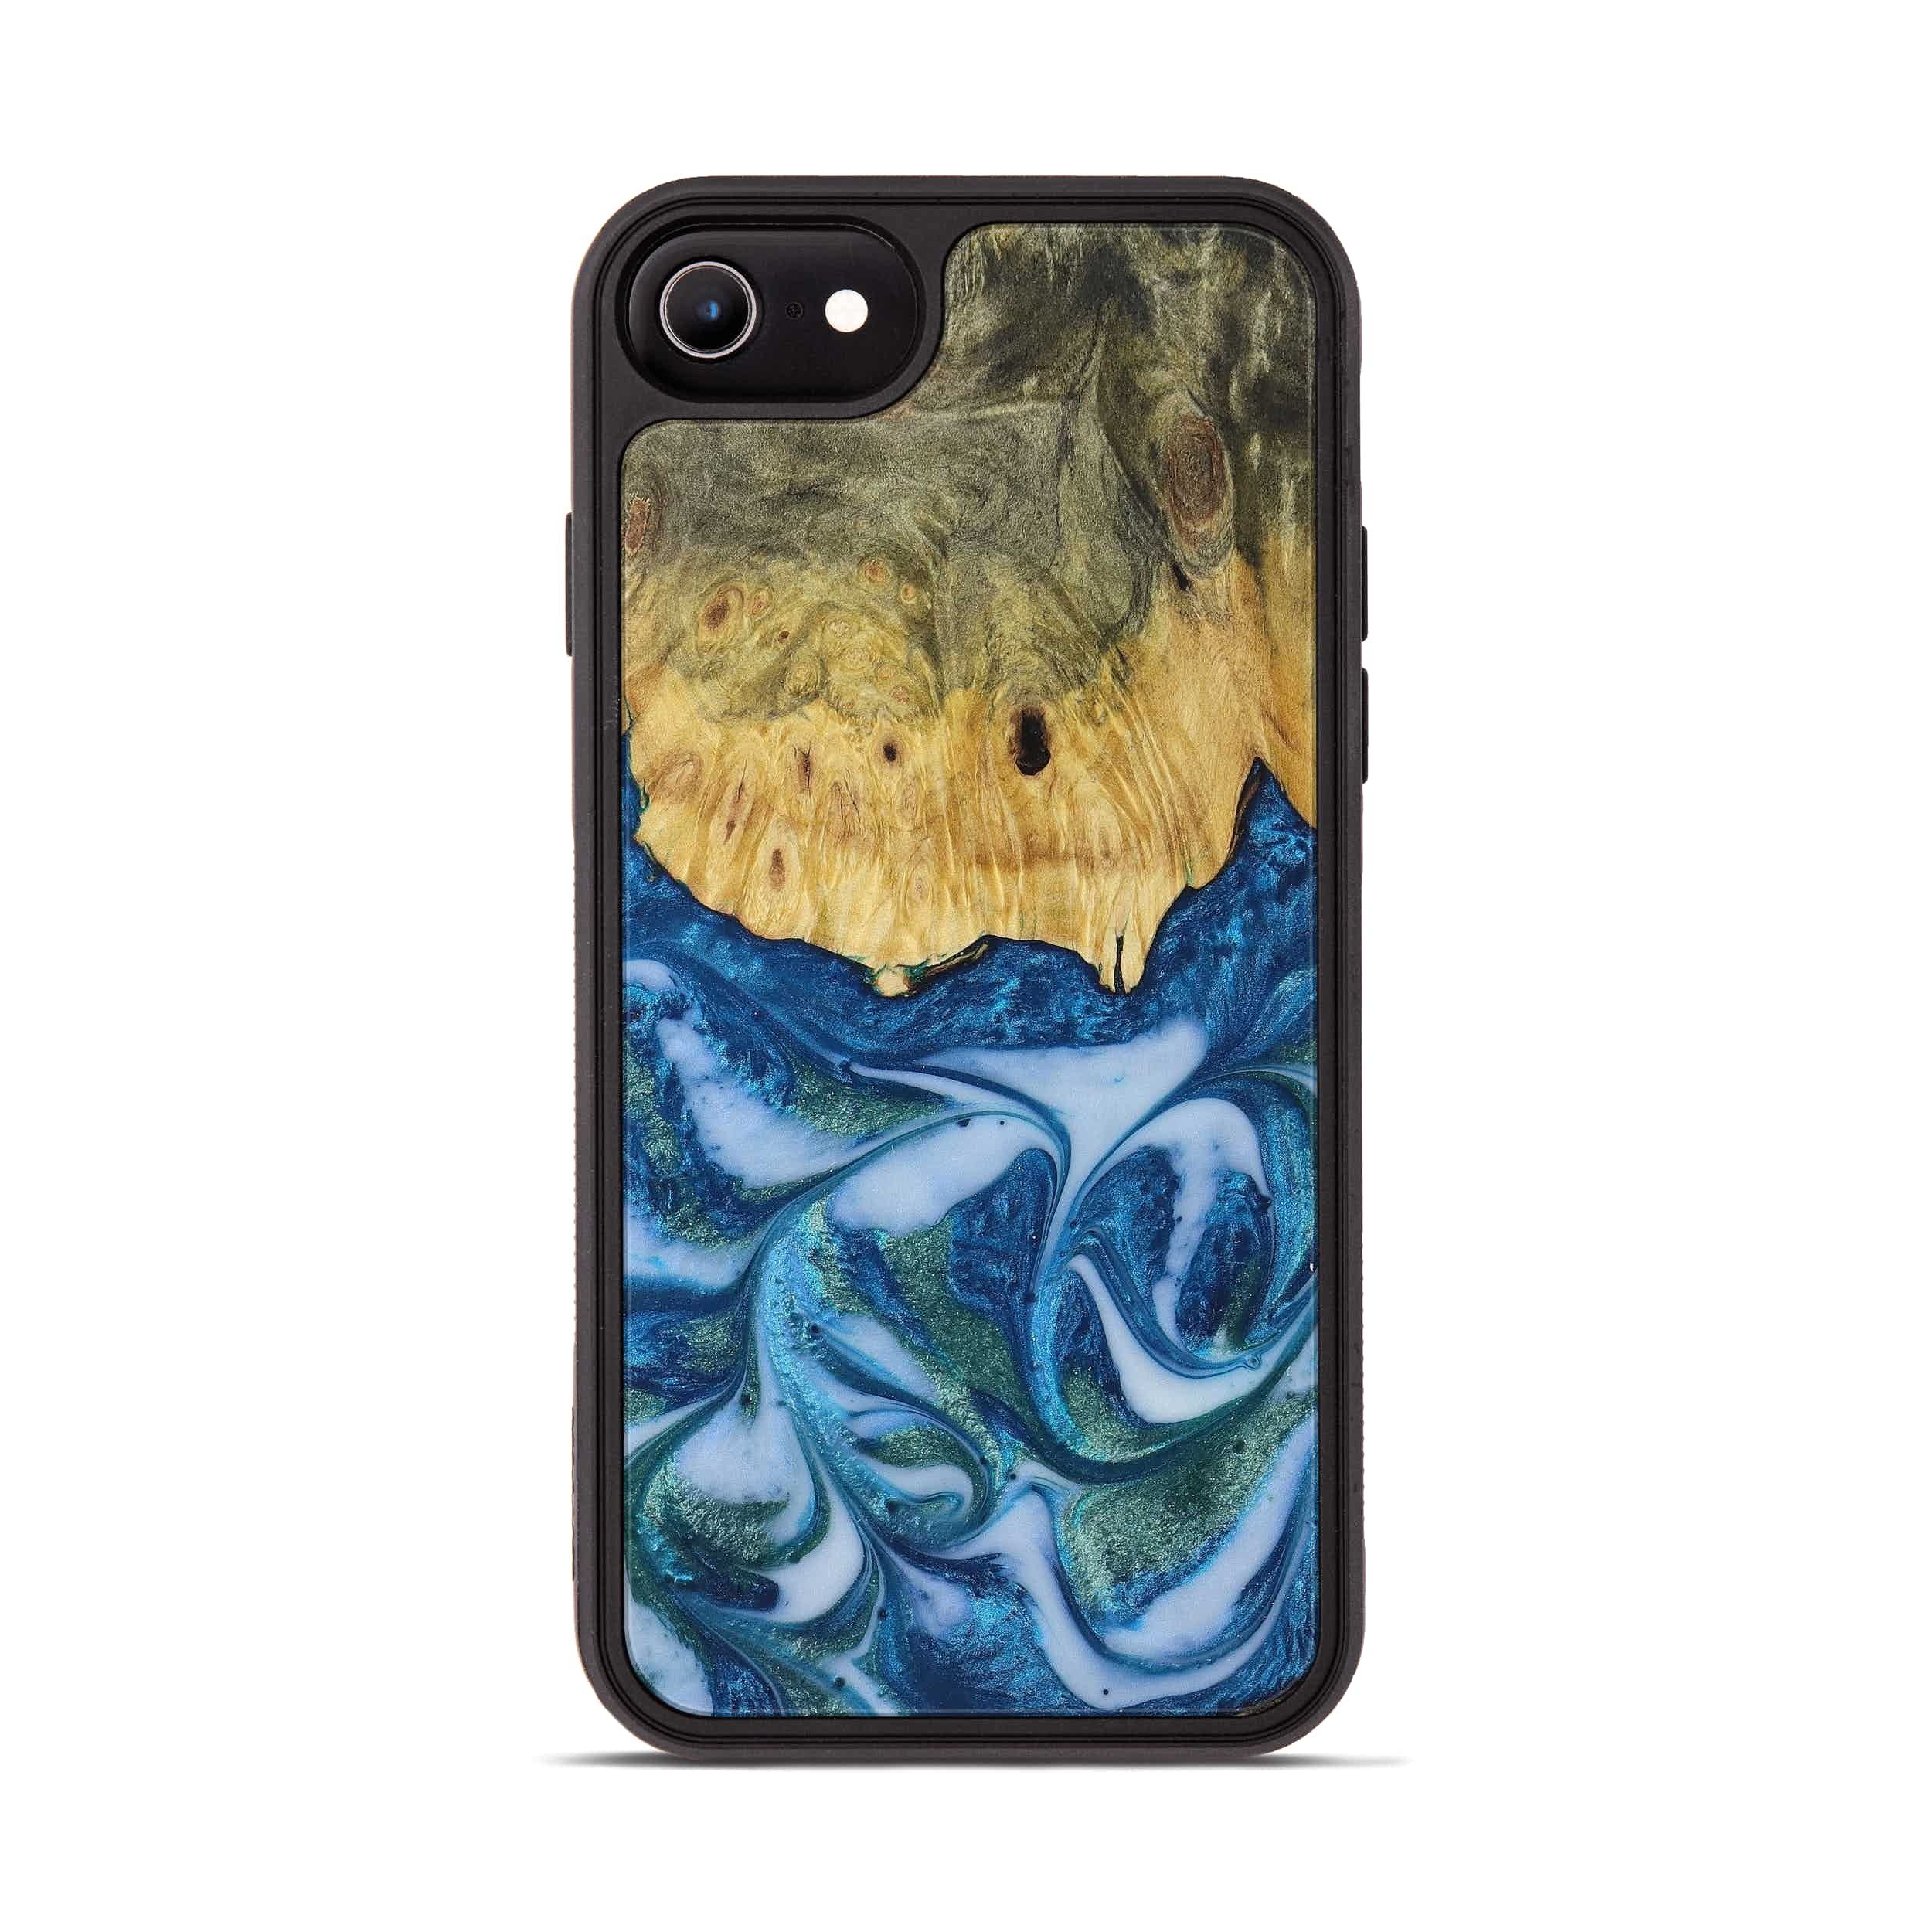 iPhone 8 Wood+Resin Phone Case - Rosanne (Light Blue, 394822)